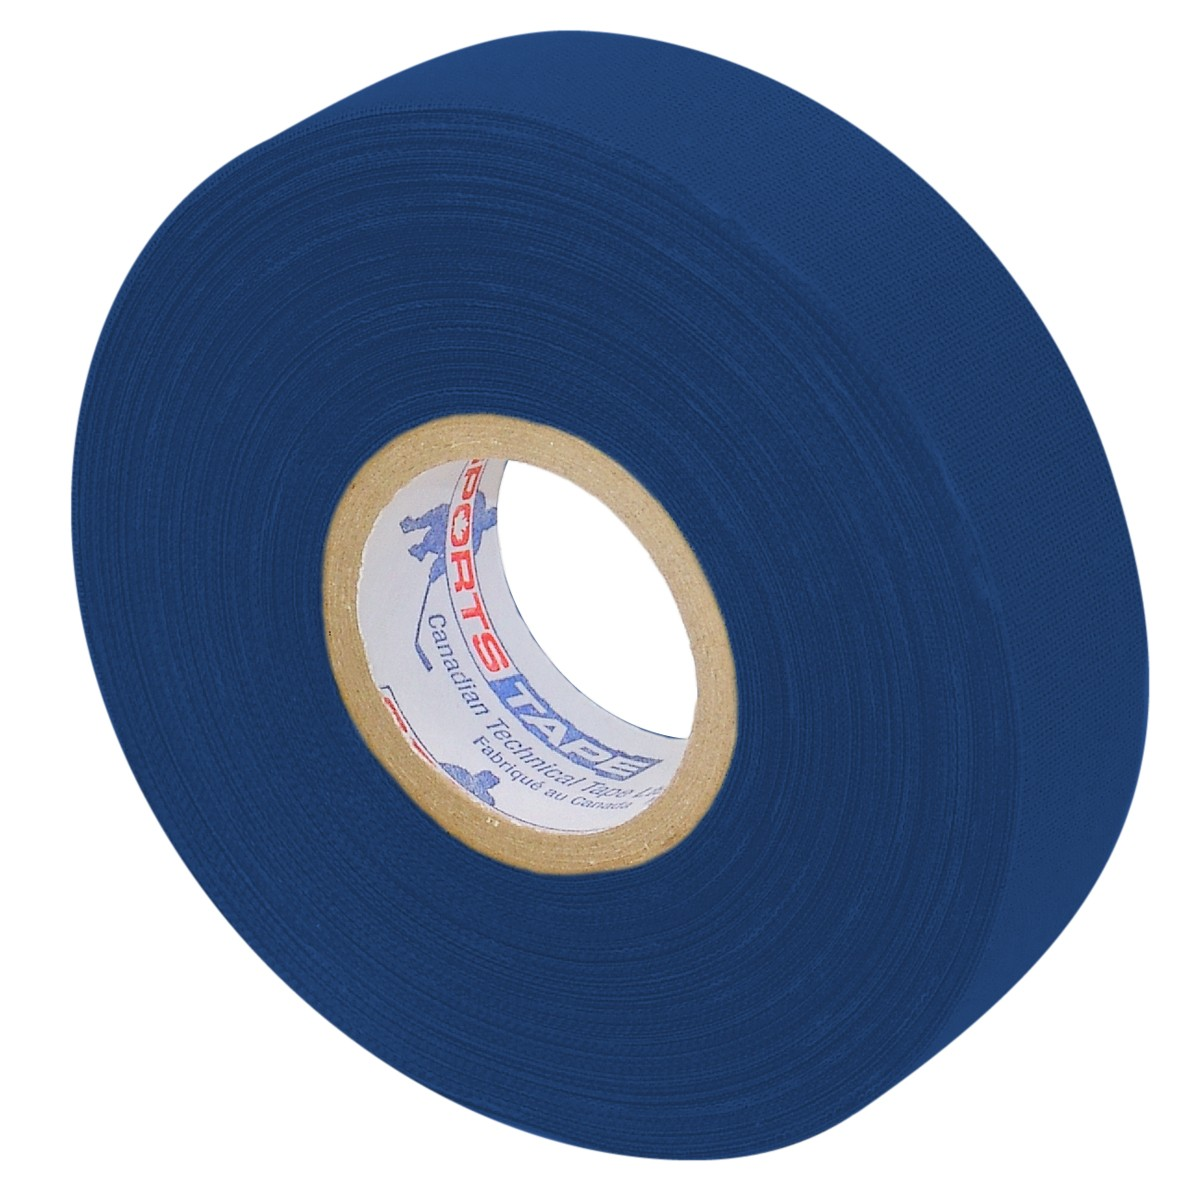 SPORTSTAPE Colored Лента для Клюшек Standart Roll 24MM X 25M